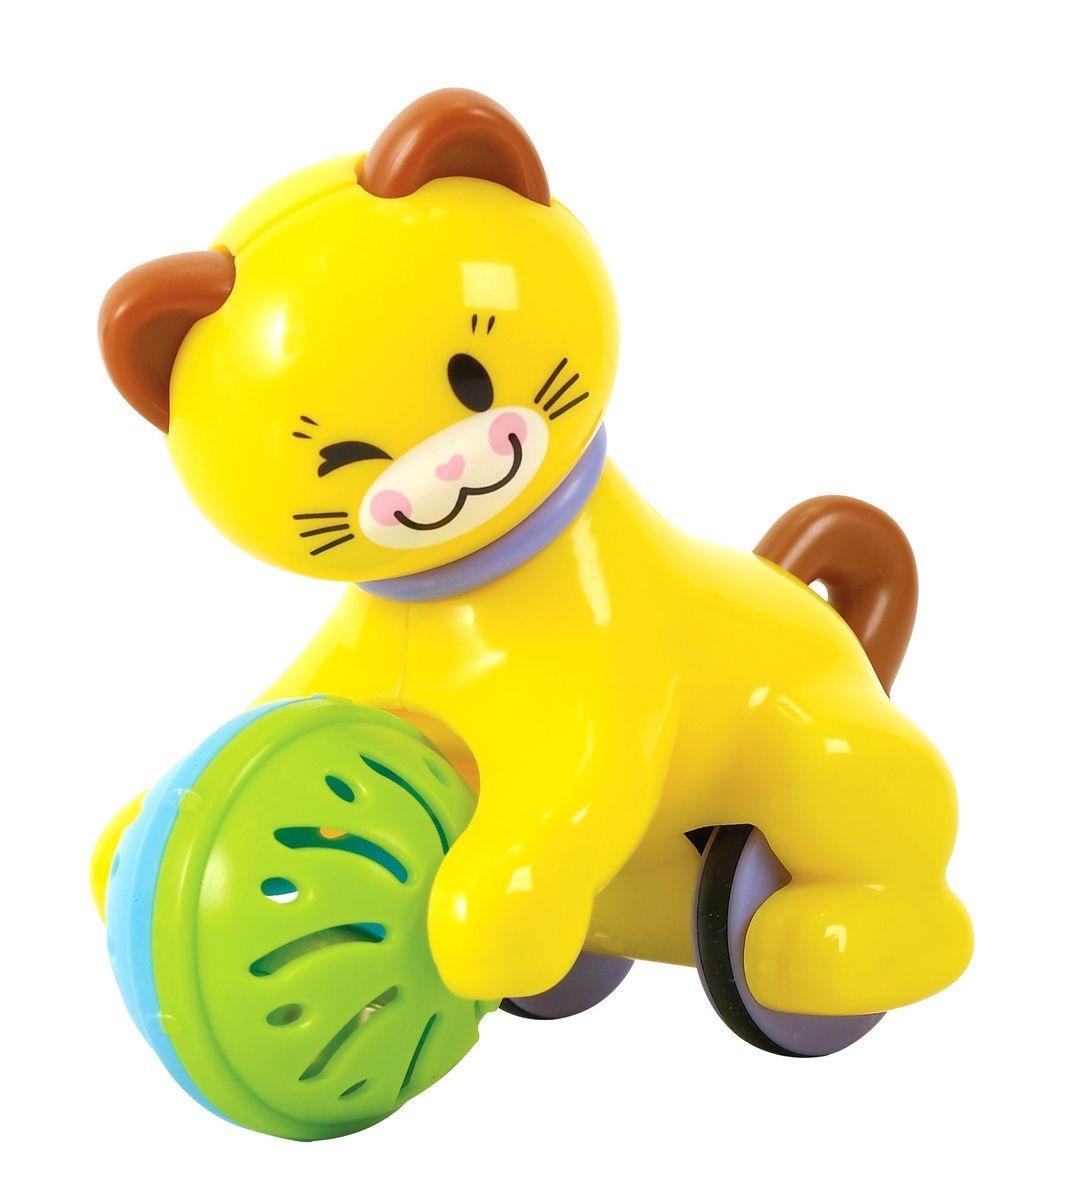 Развивающая игрушка – Котенок с колесикамиРазвивающие игрушки PlayGo<br>Развивающая игрушка – Котенок с колесиками<br>